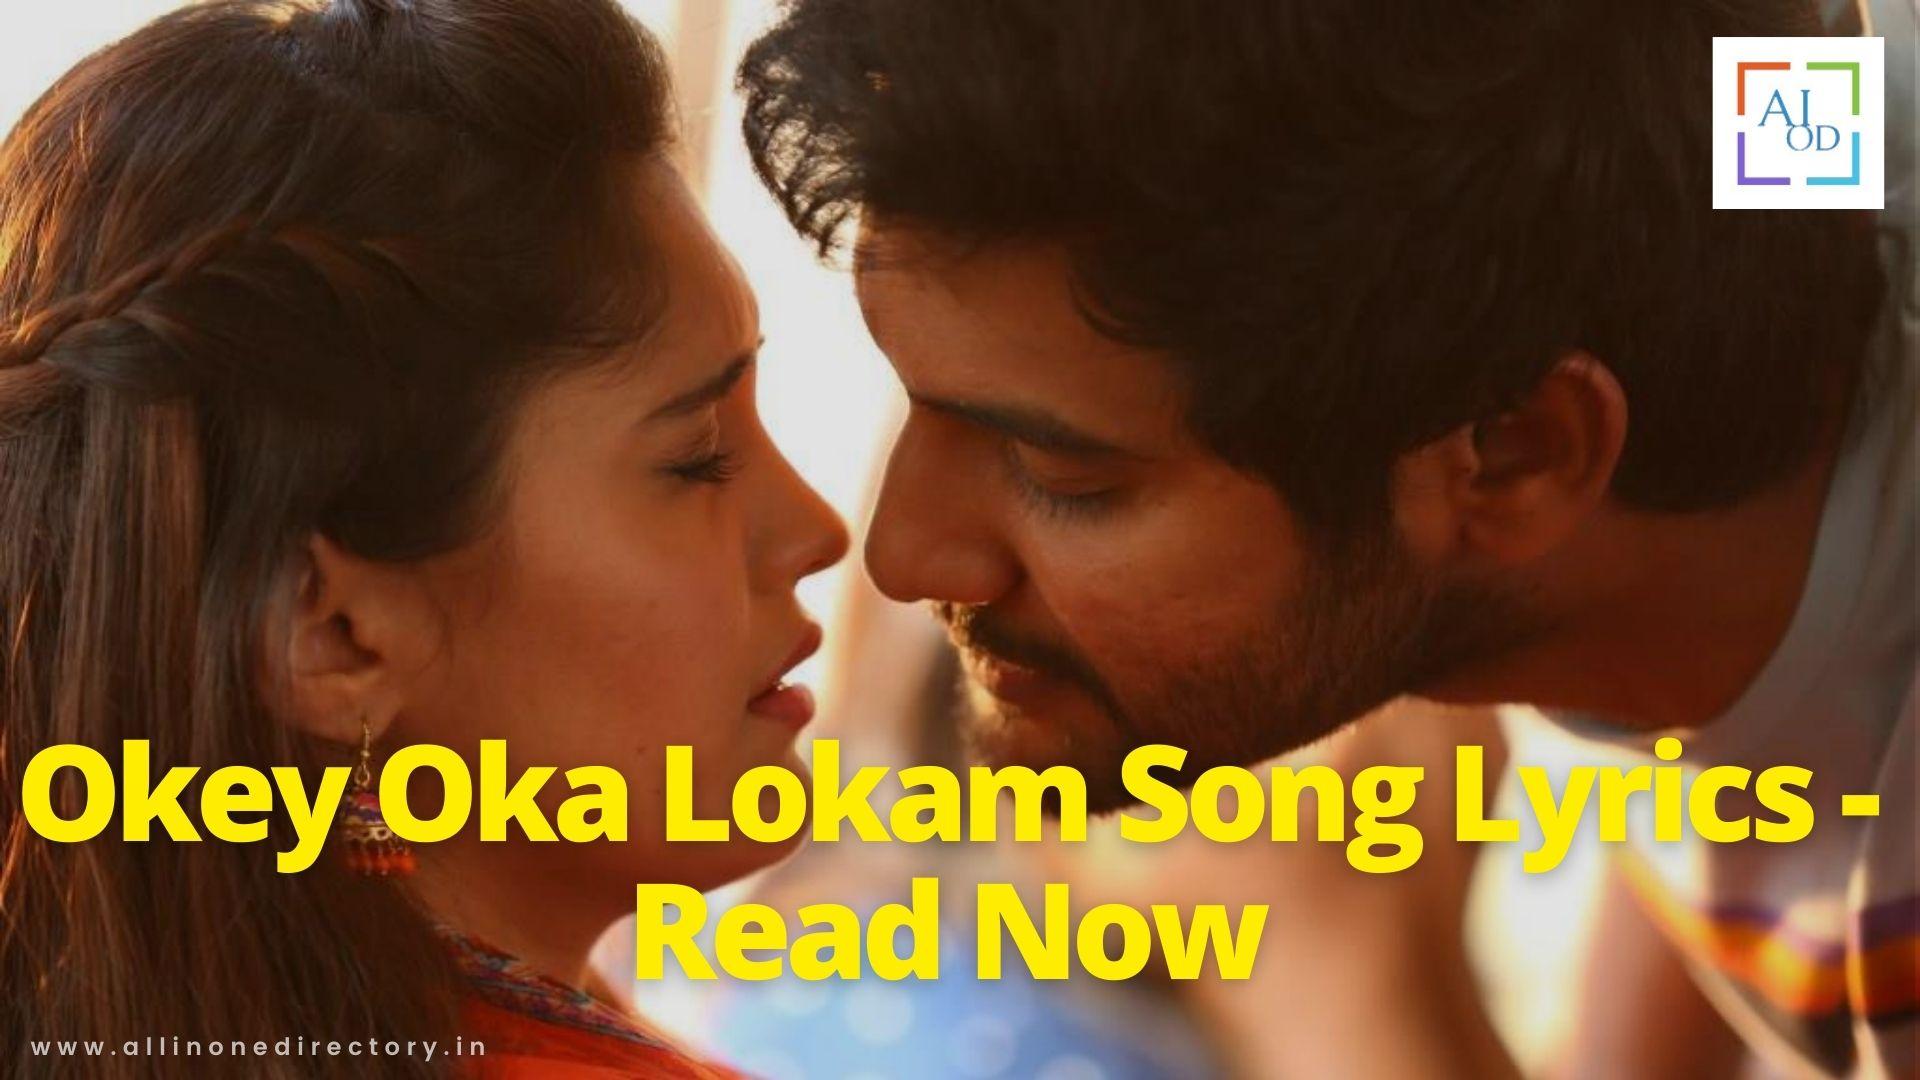 Okey Oka Lokam Song Lyrics - Read Now